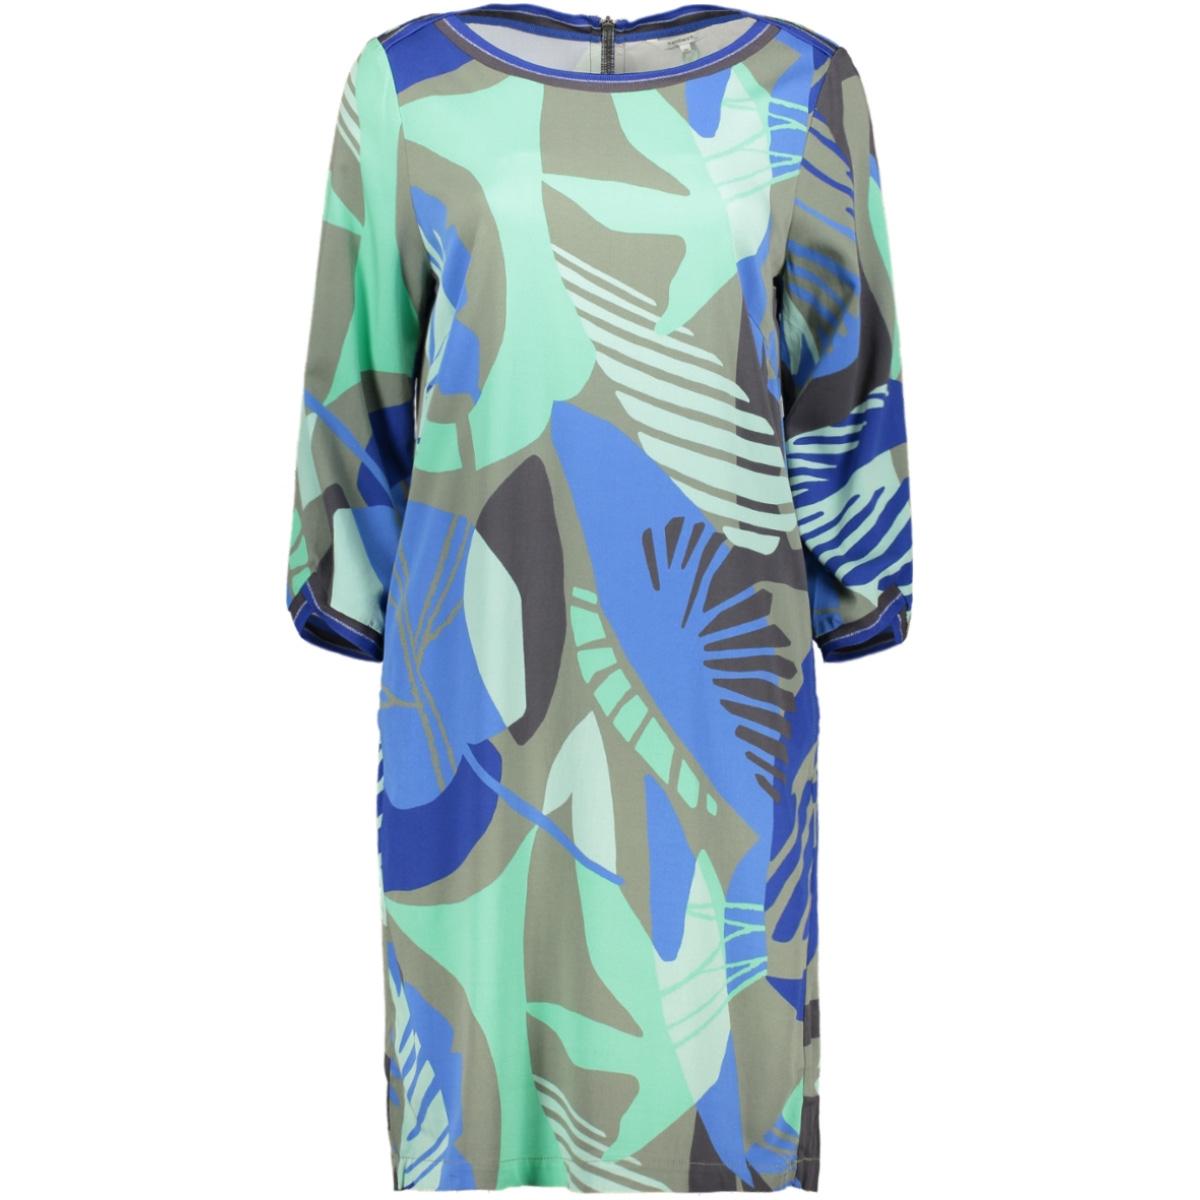 jurk met organische print 23001701 sandwich jurk 50012